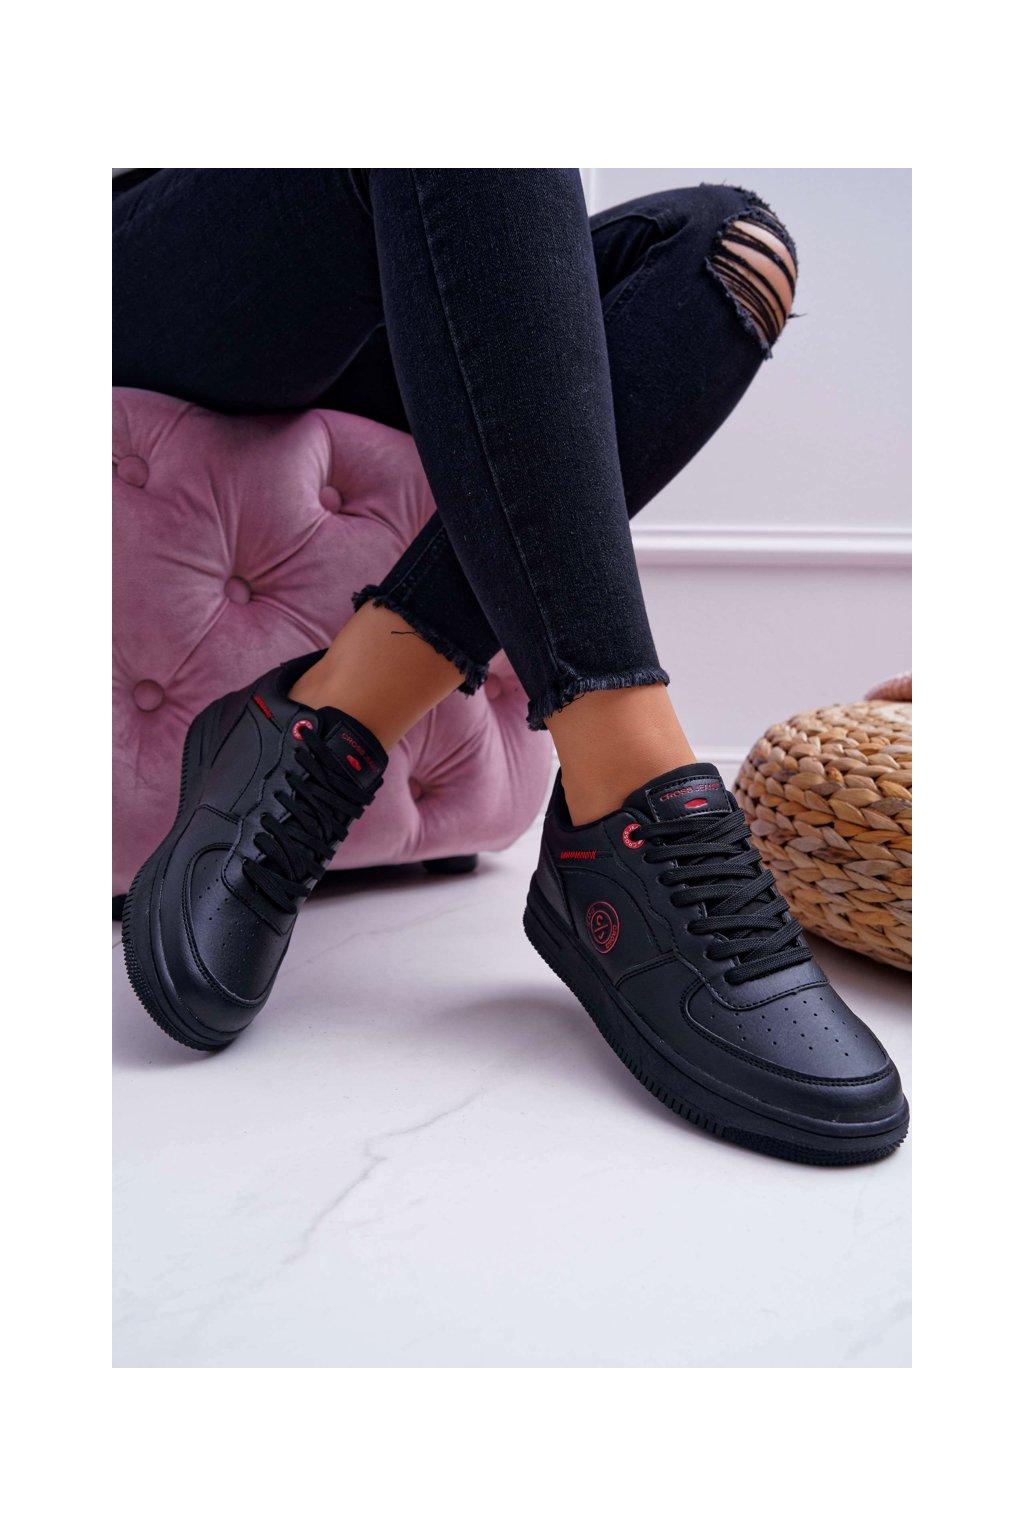 Dámske tenisky Cross Jeans čierne EE2R4144C